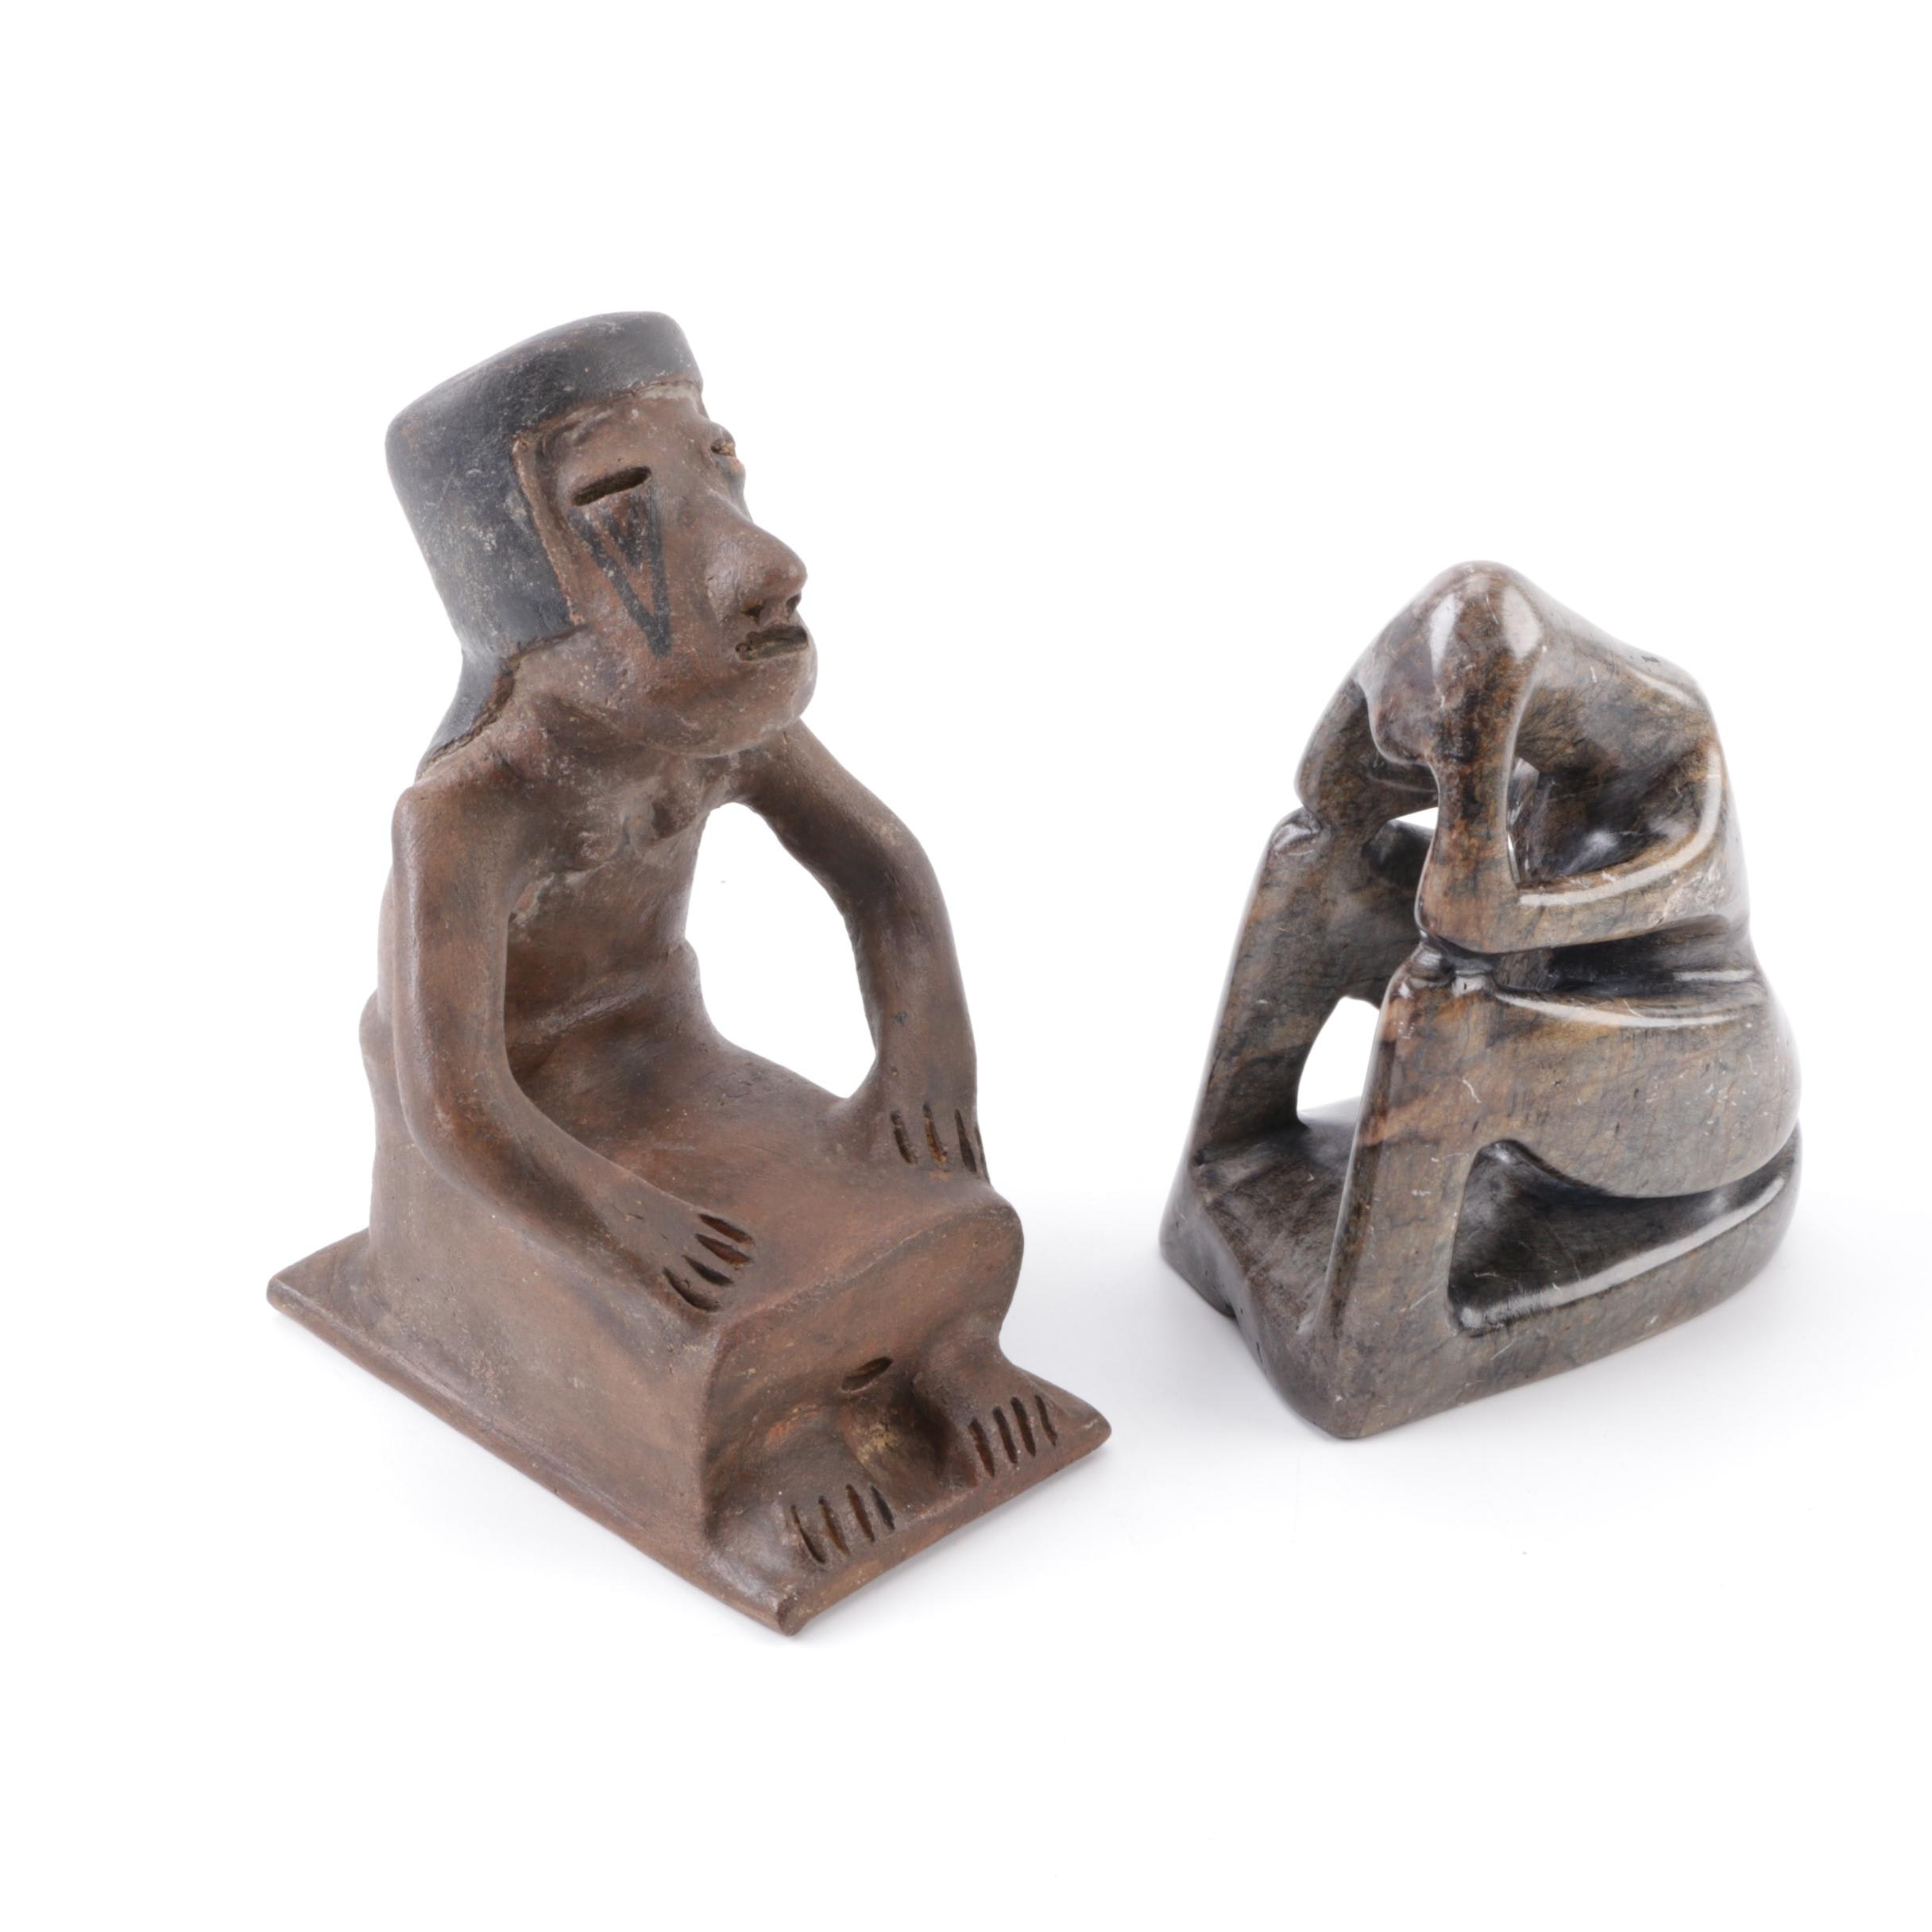 Pair of Seated Figurines